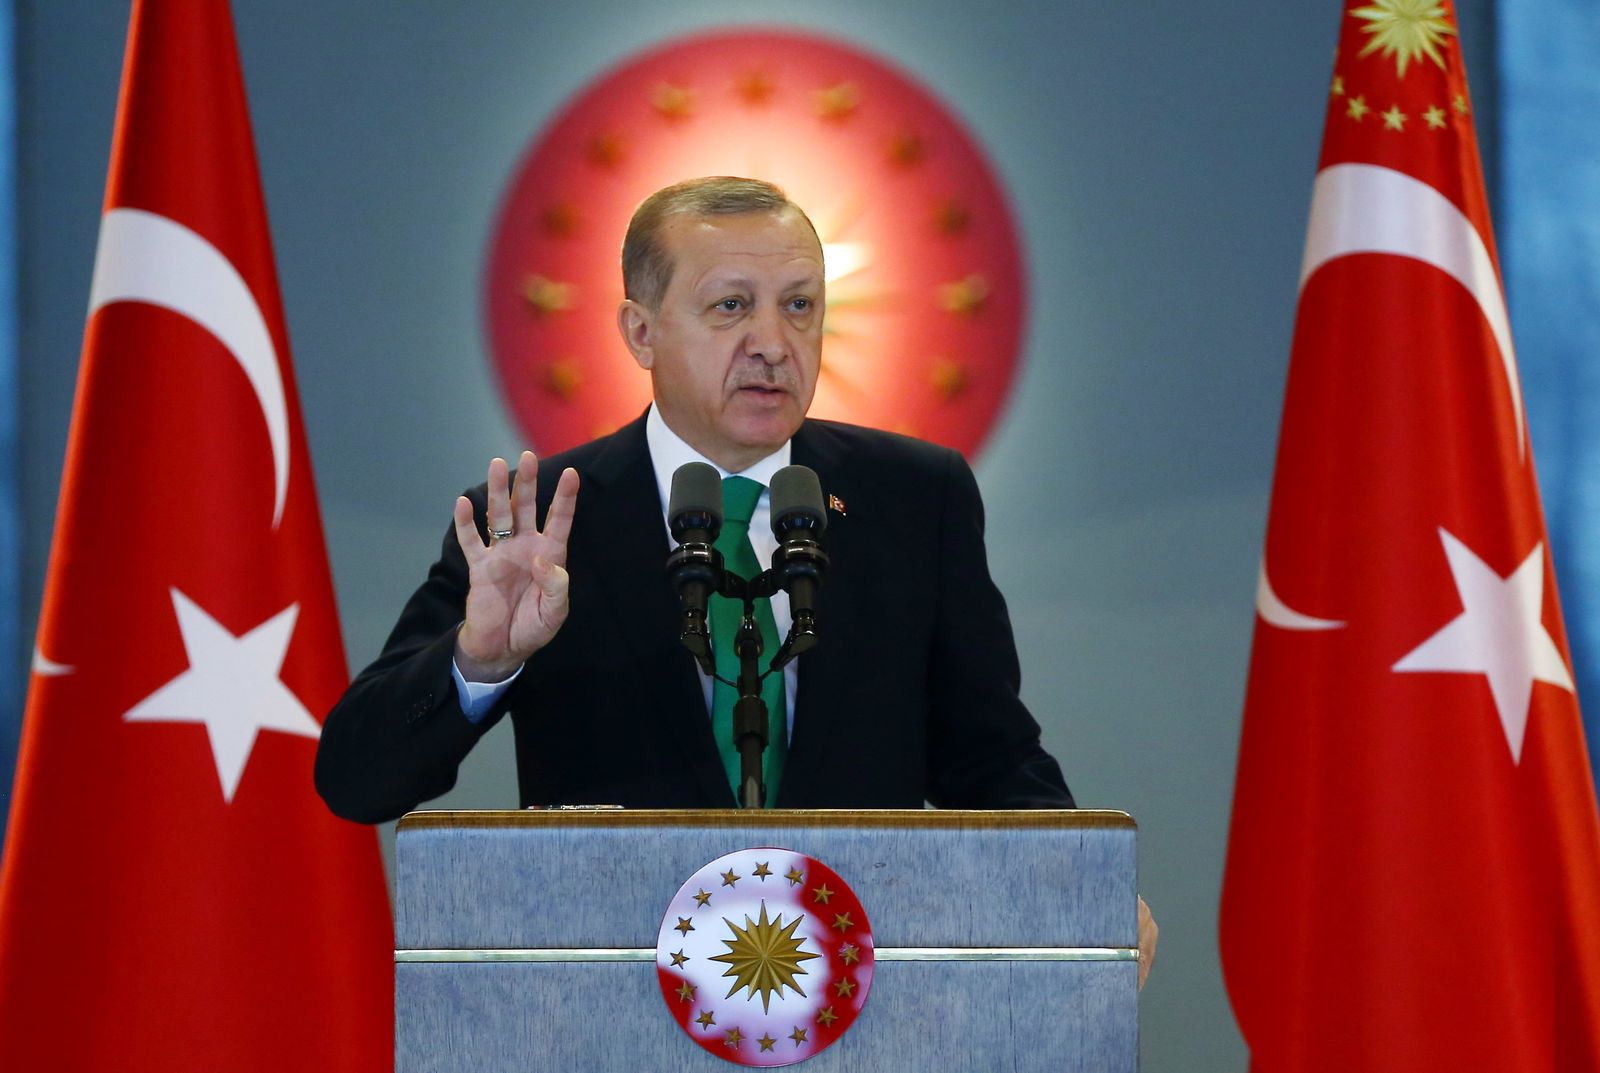 Recep Tayyip Erdogan / das neue Präsidialsystem